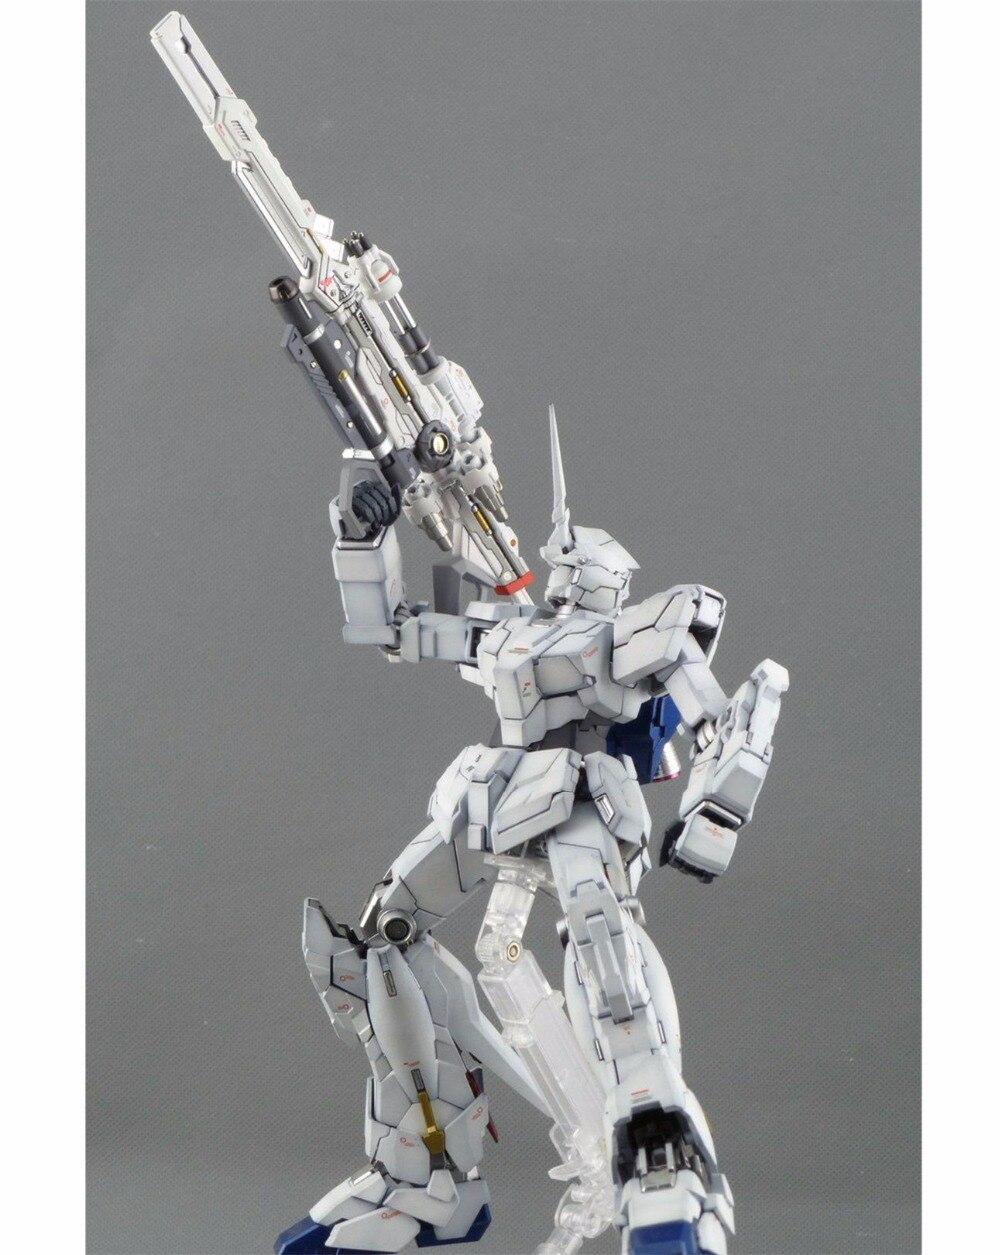 BTF Caledbwlch Honoo HJ Build Weapon for Bandai MG 1 100 MBF P02 Gundam Astray Red